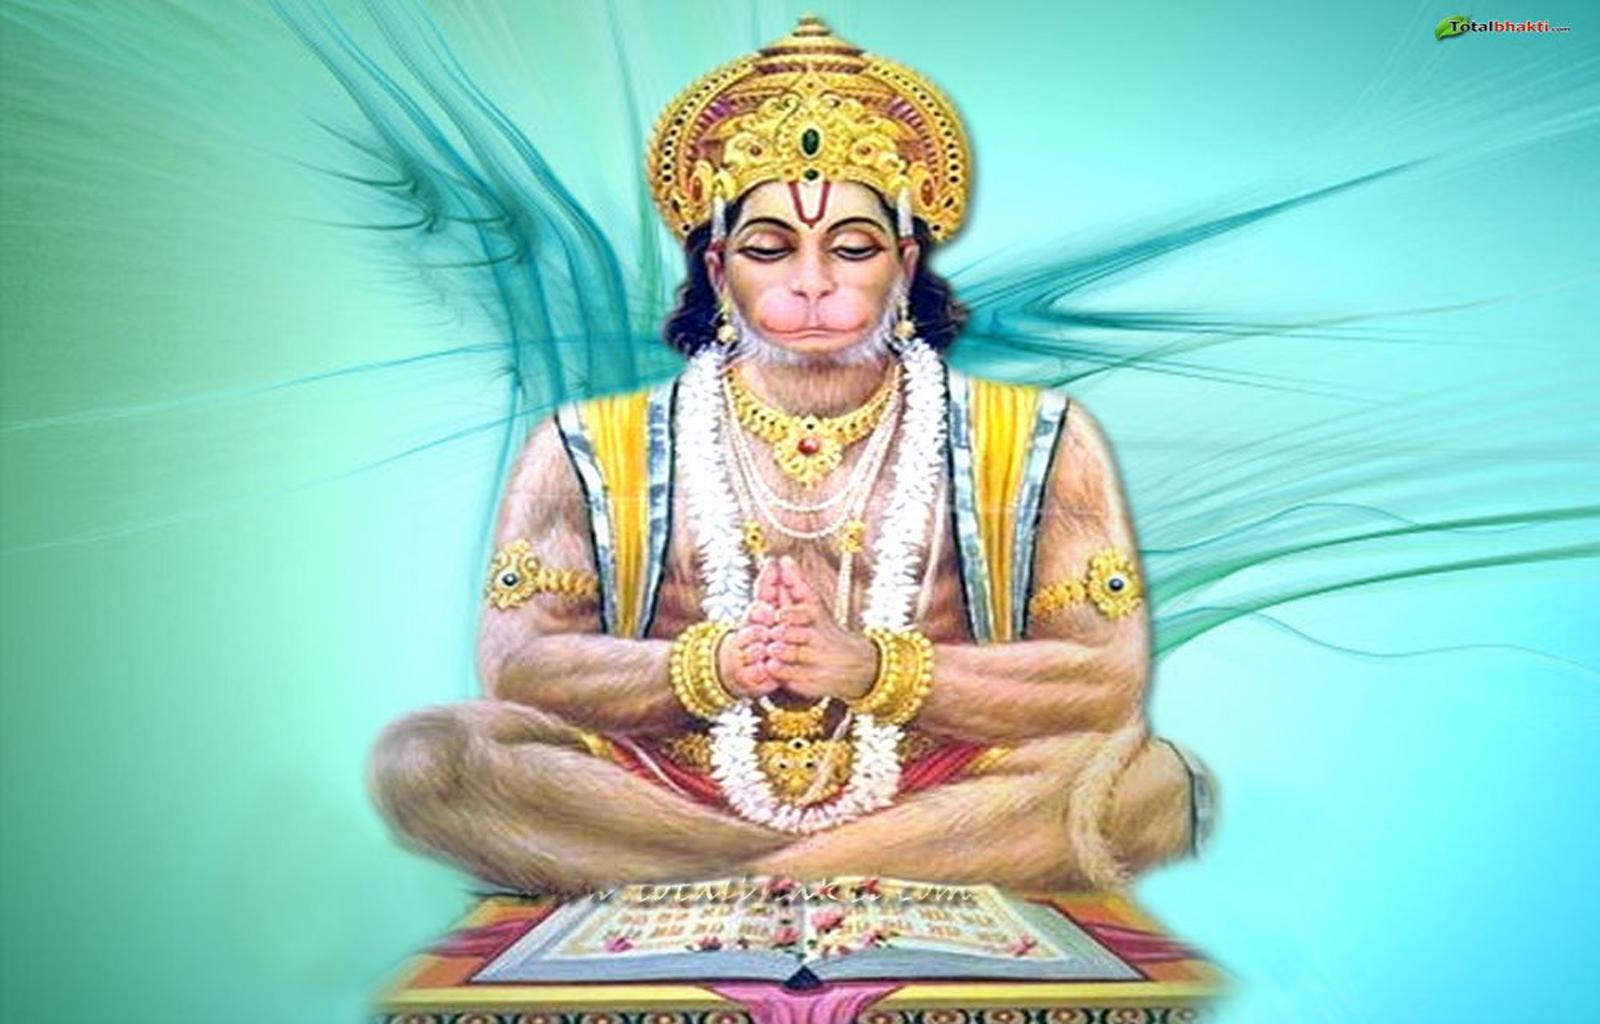 Lord Hanuman Ji Ram Bhakt Images With Hd Wallpapers God Wallpaper